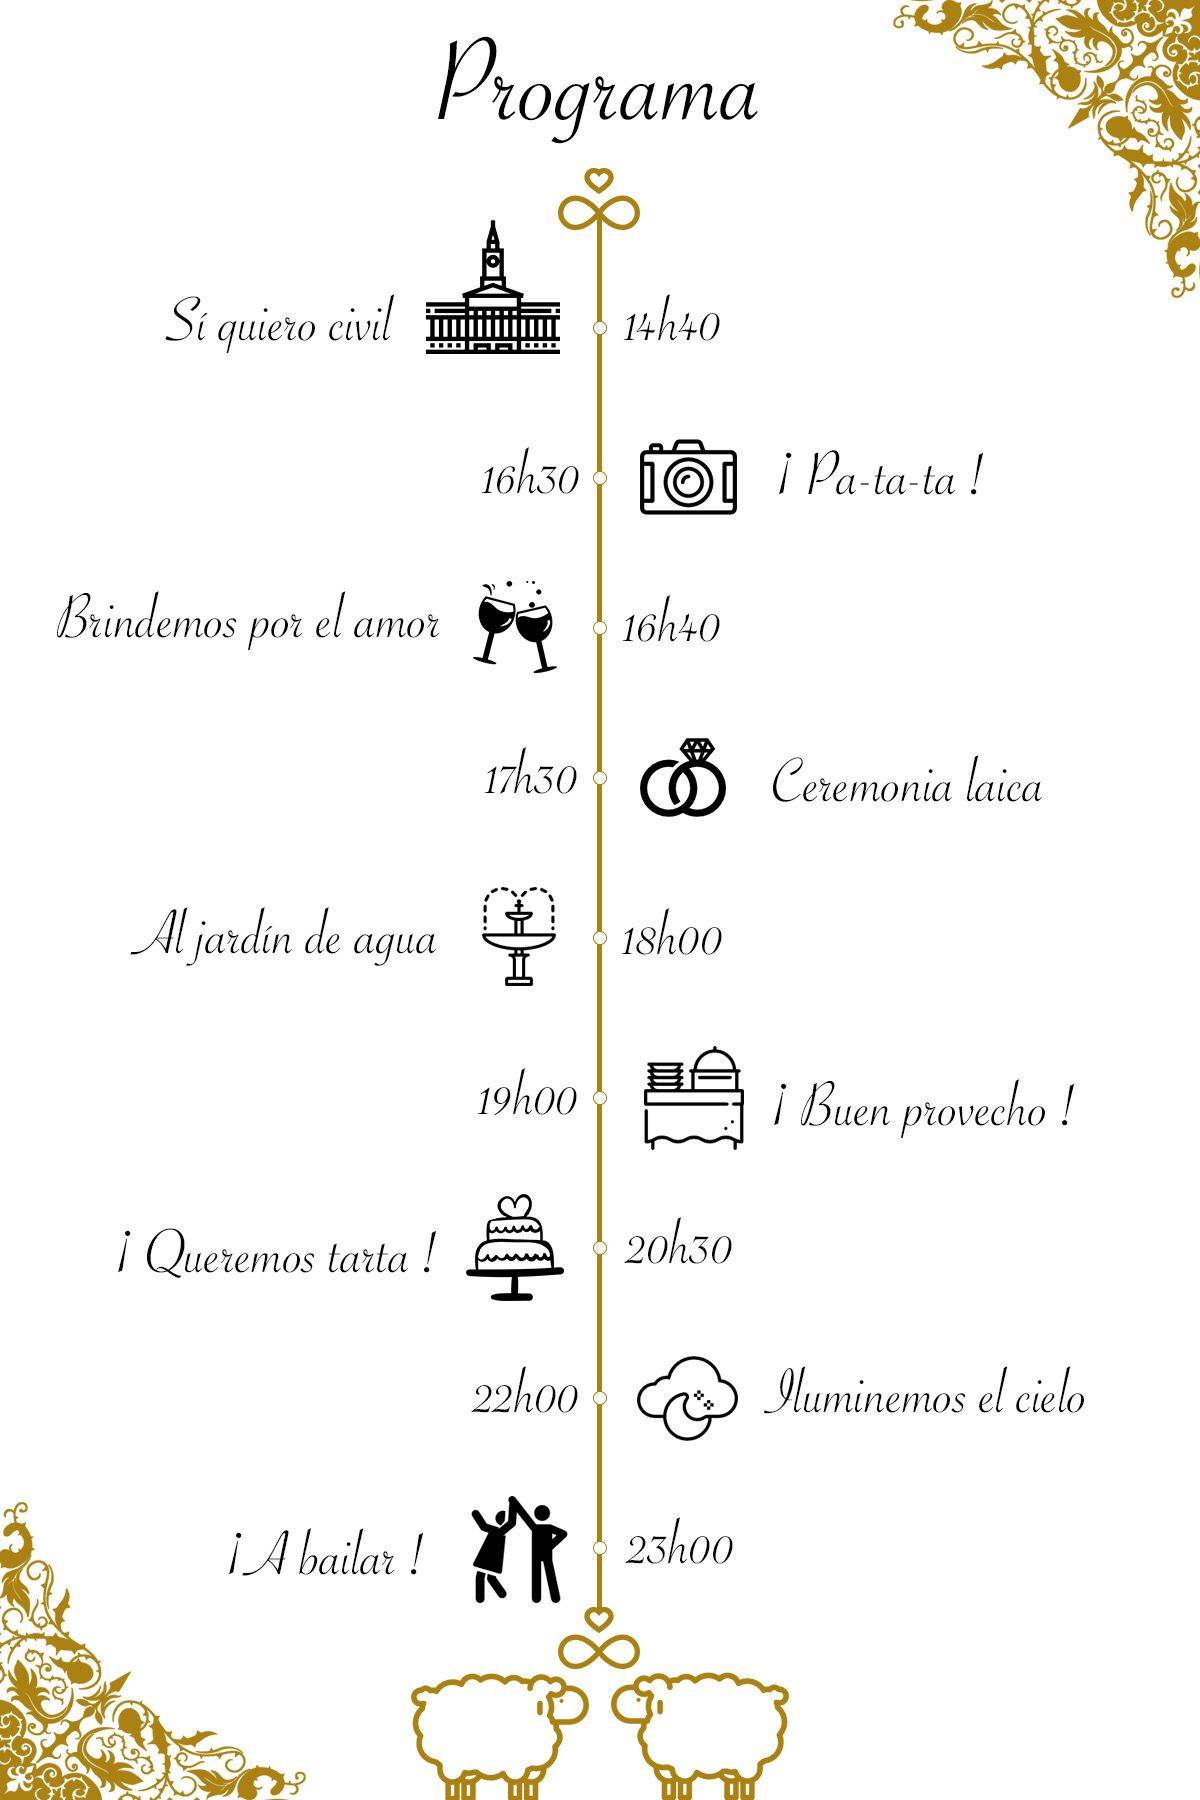 Mi programa de bodas en español Programa de boda